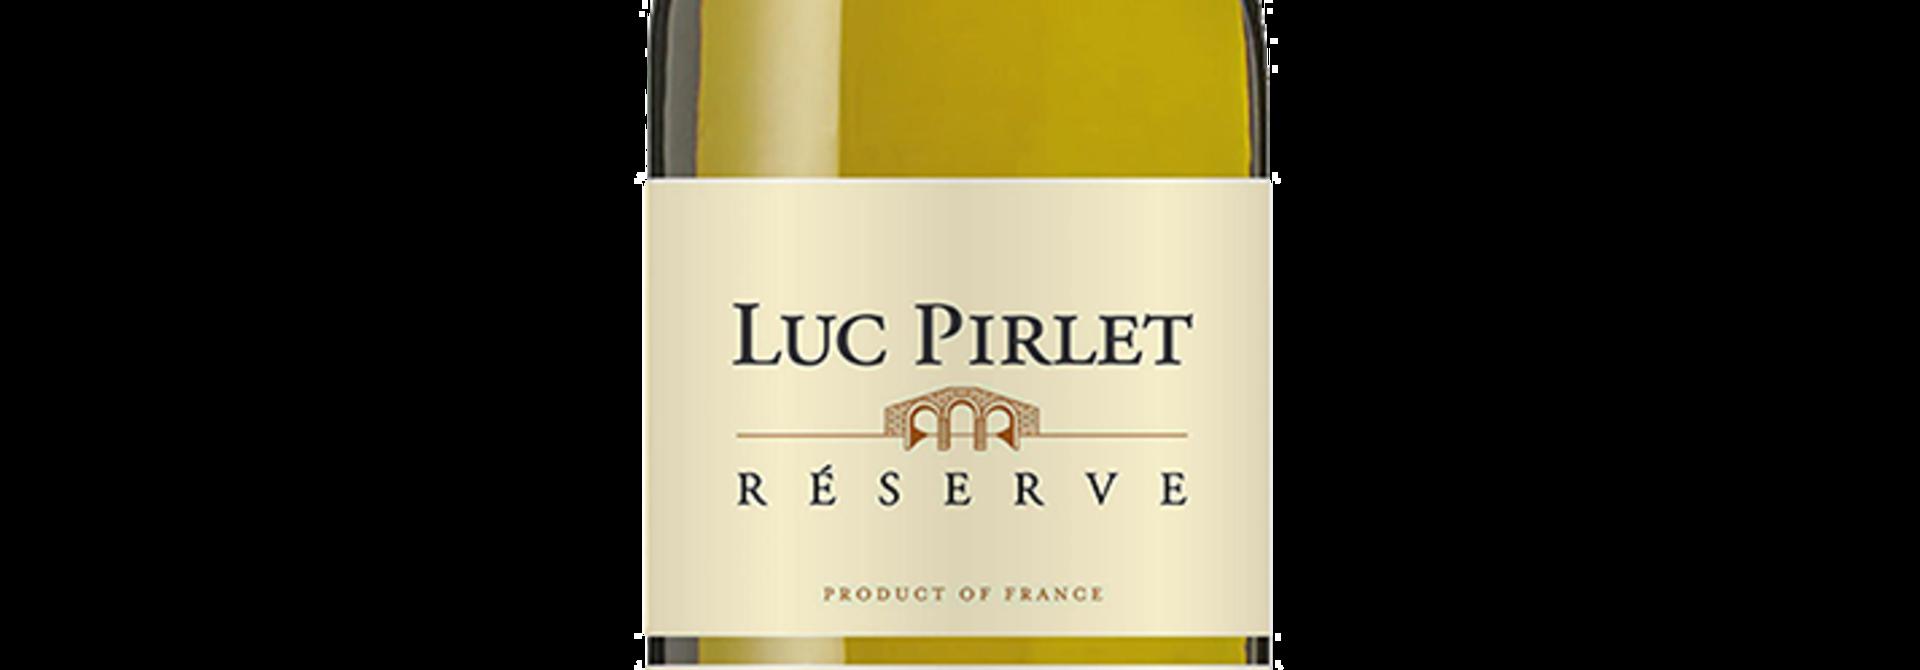 Viognier Reserve 2017, Luc Pirlet